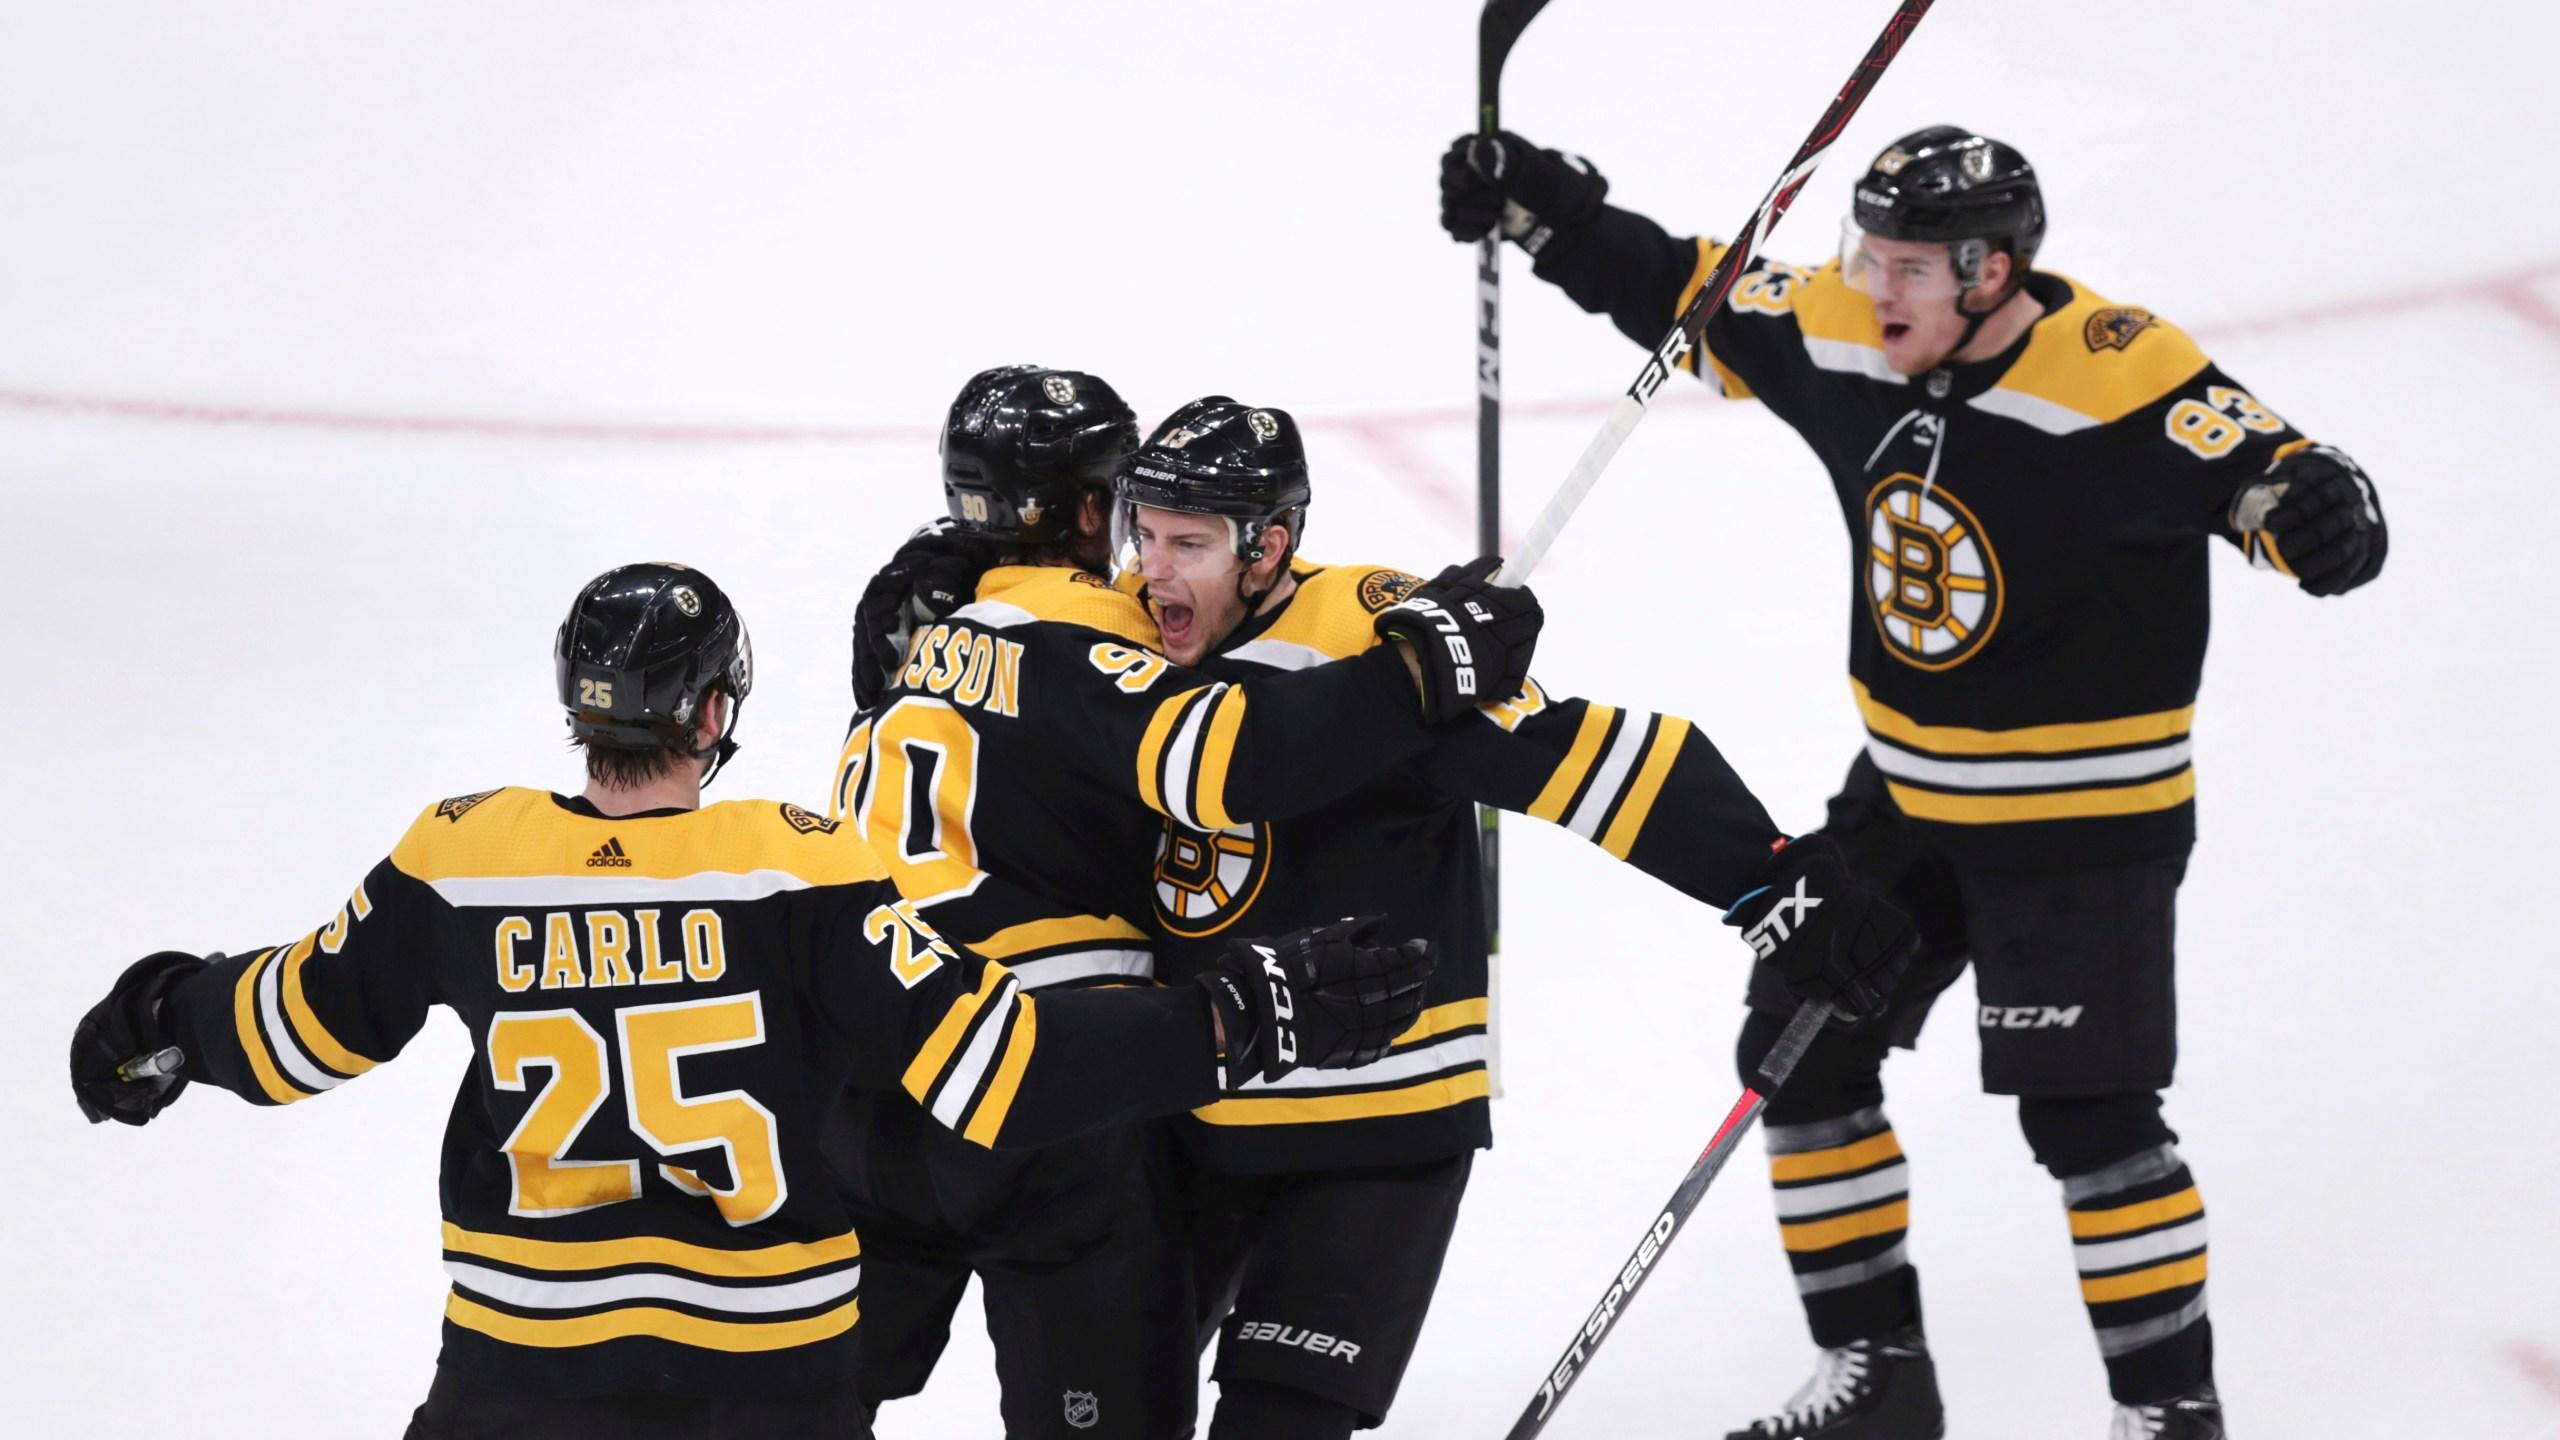 Maple_Leafs_Bruins_Hockey_88653-159532.jpg72666315